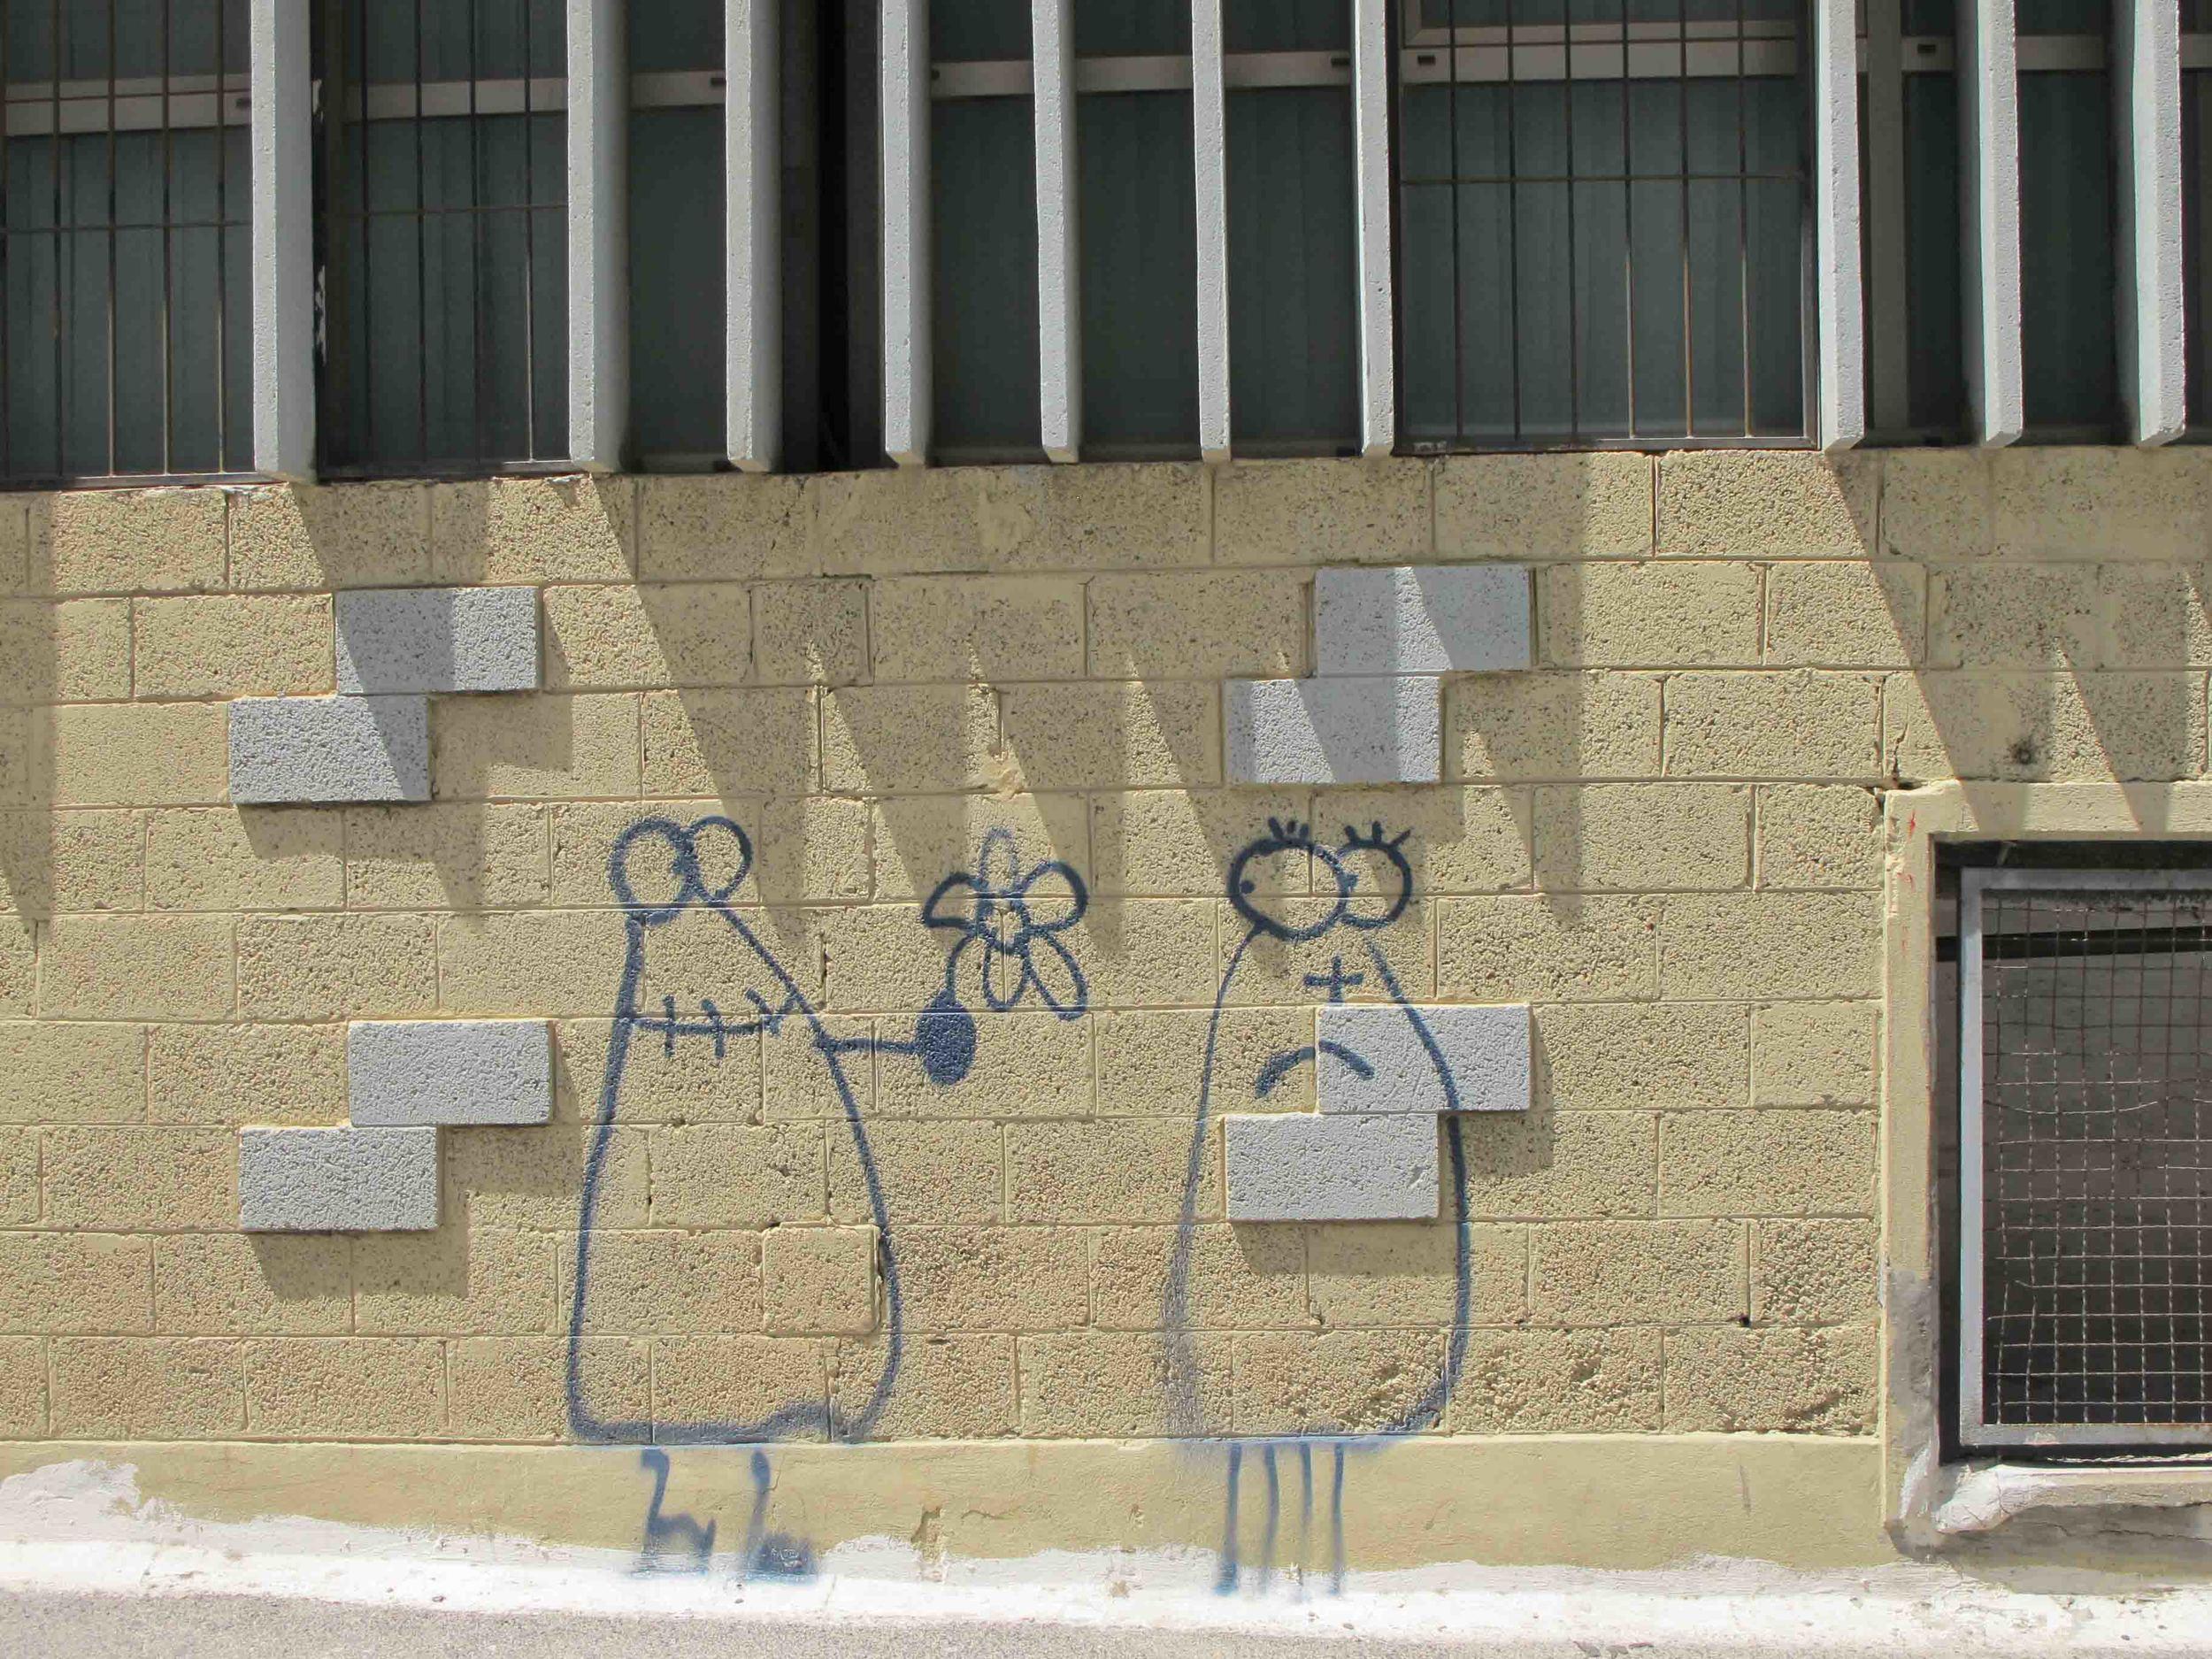 GRAFFITI AND STREET ART IN TEL AVIV